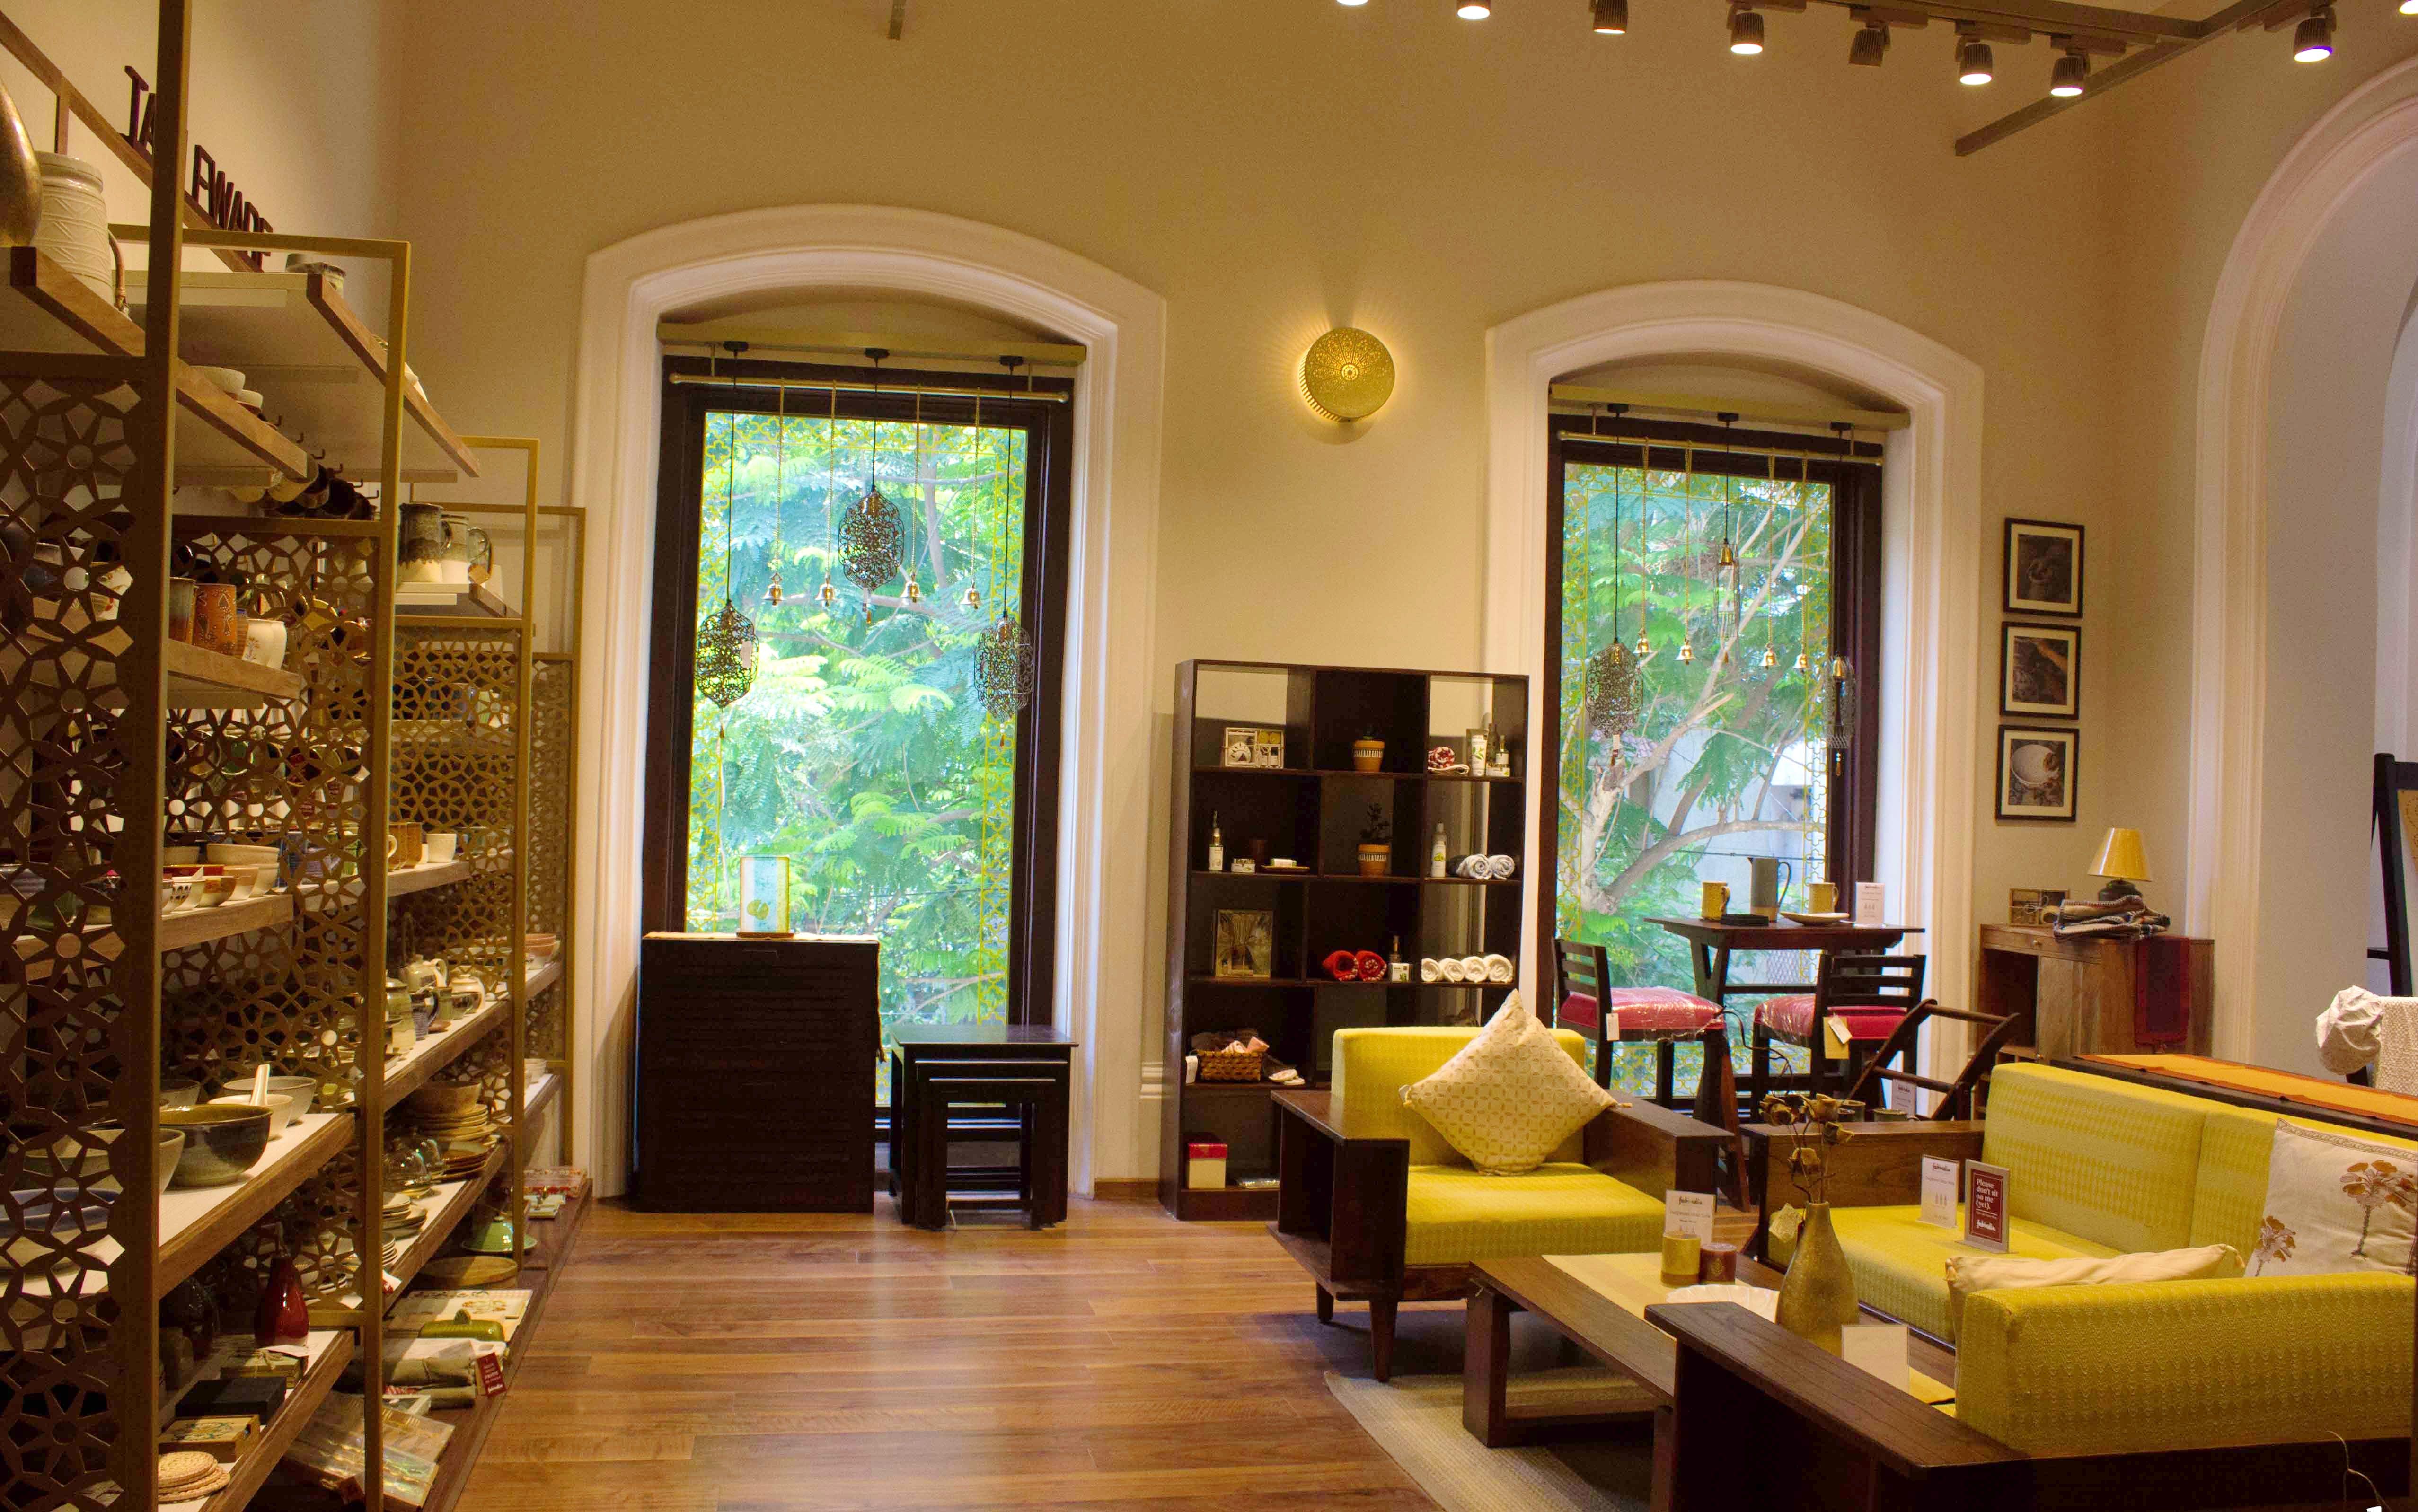 image - Fabindia Experience Center